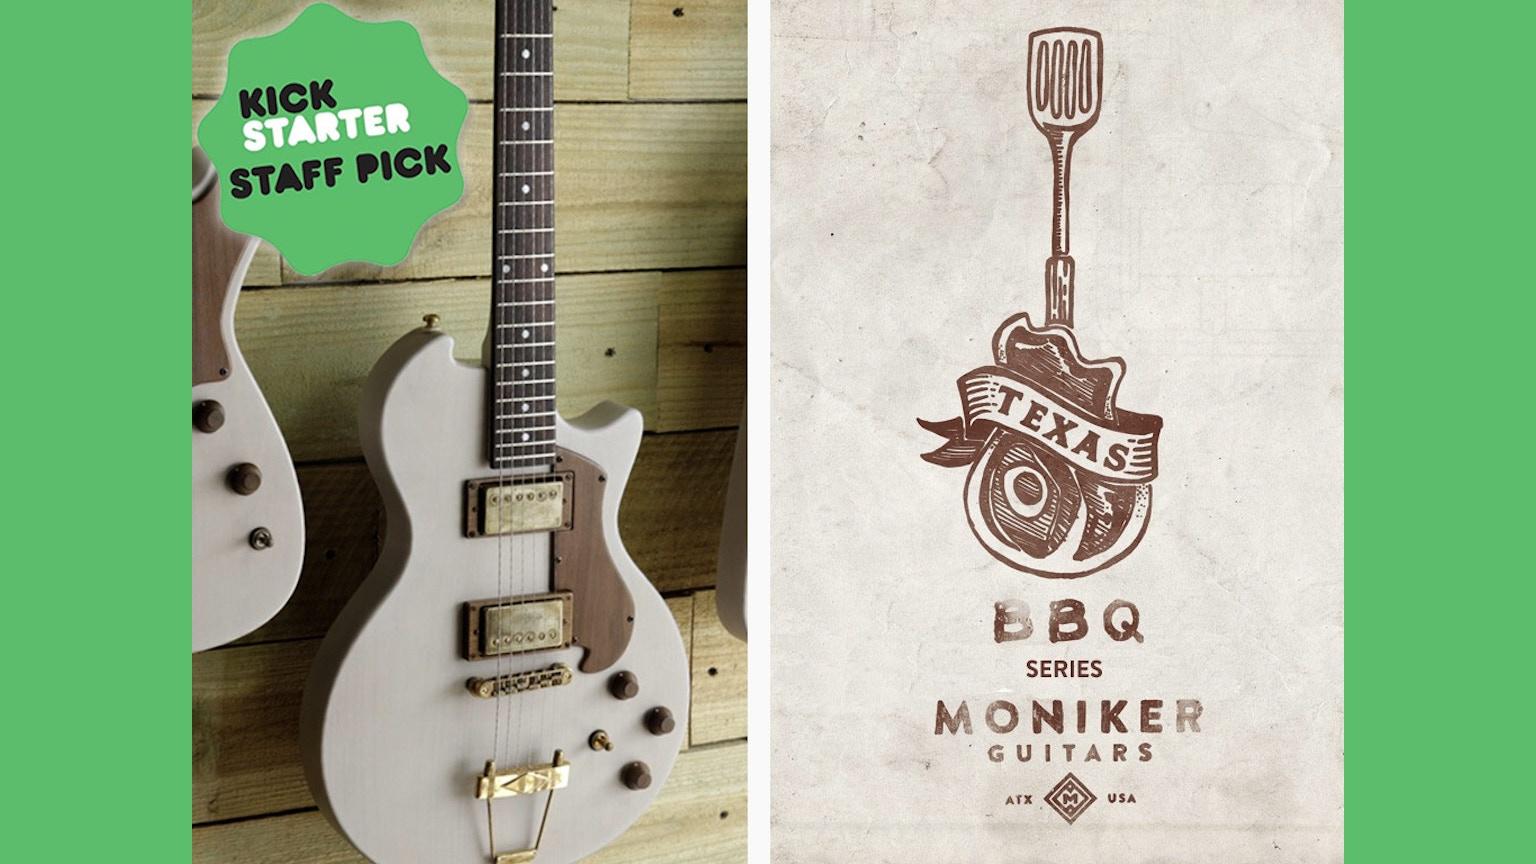 moniker guitars design your custom guitar online tx bbq by kevin tully kickstarter. Black Bedroom Furniture Sets. Home Design Ideas